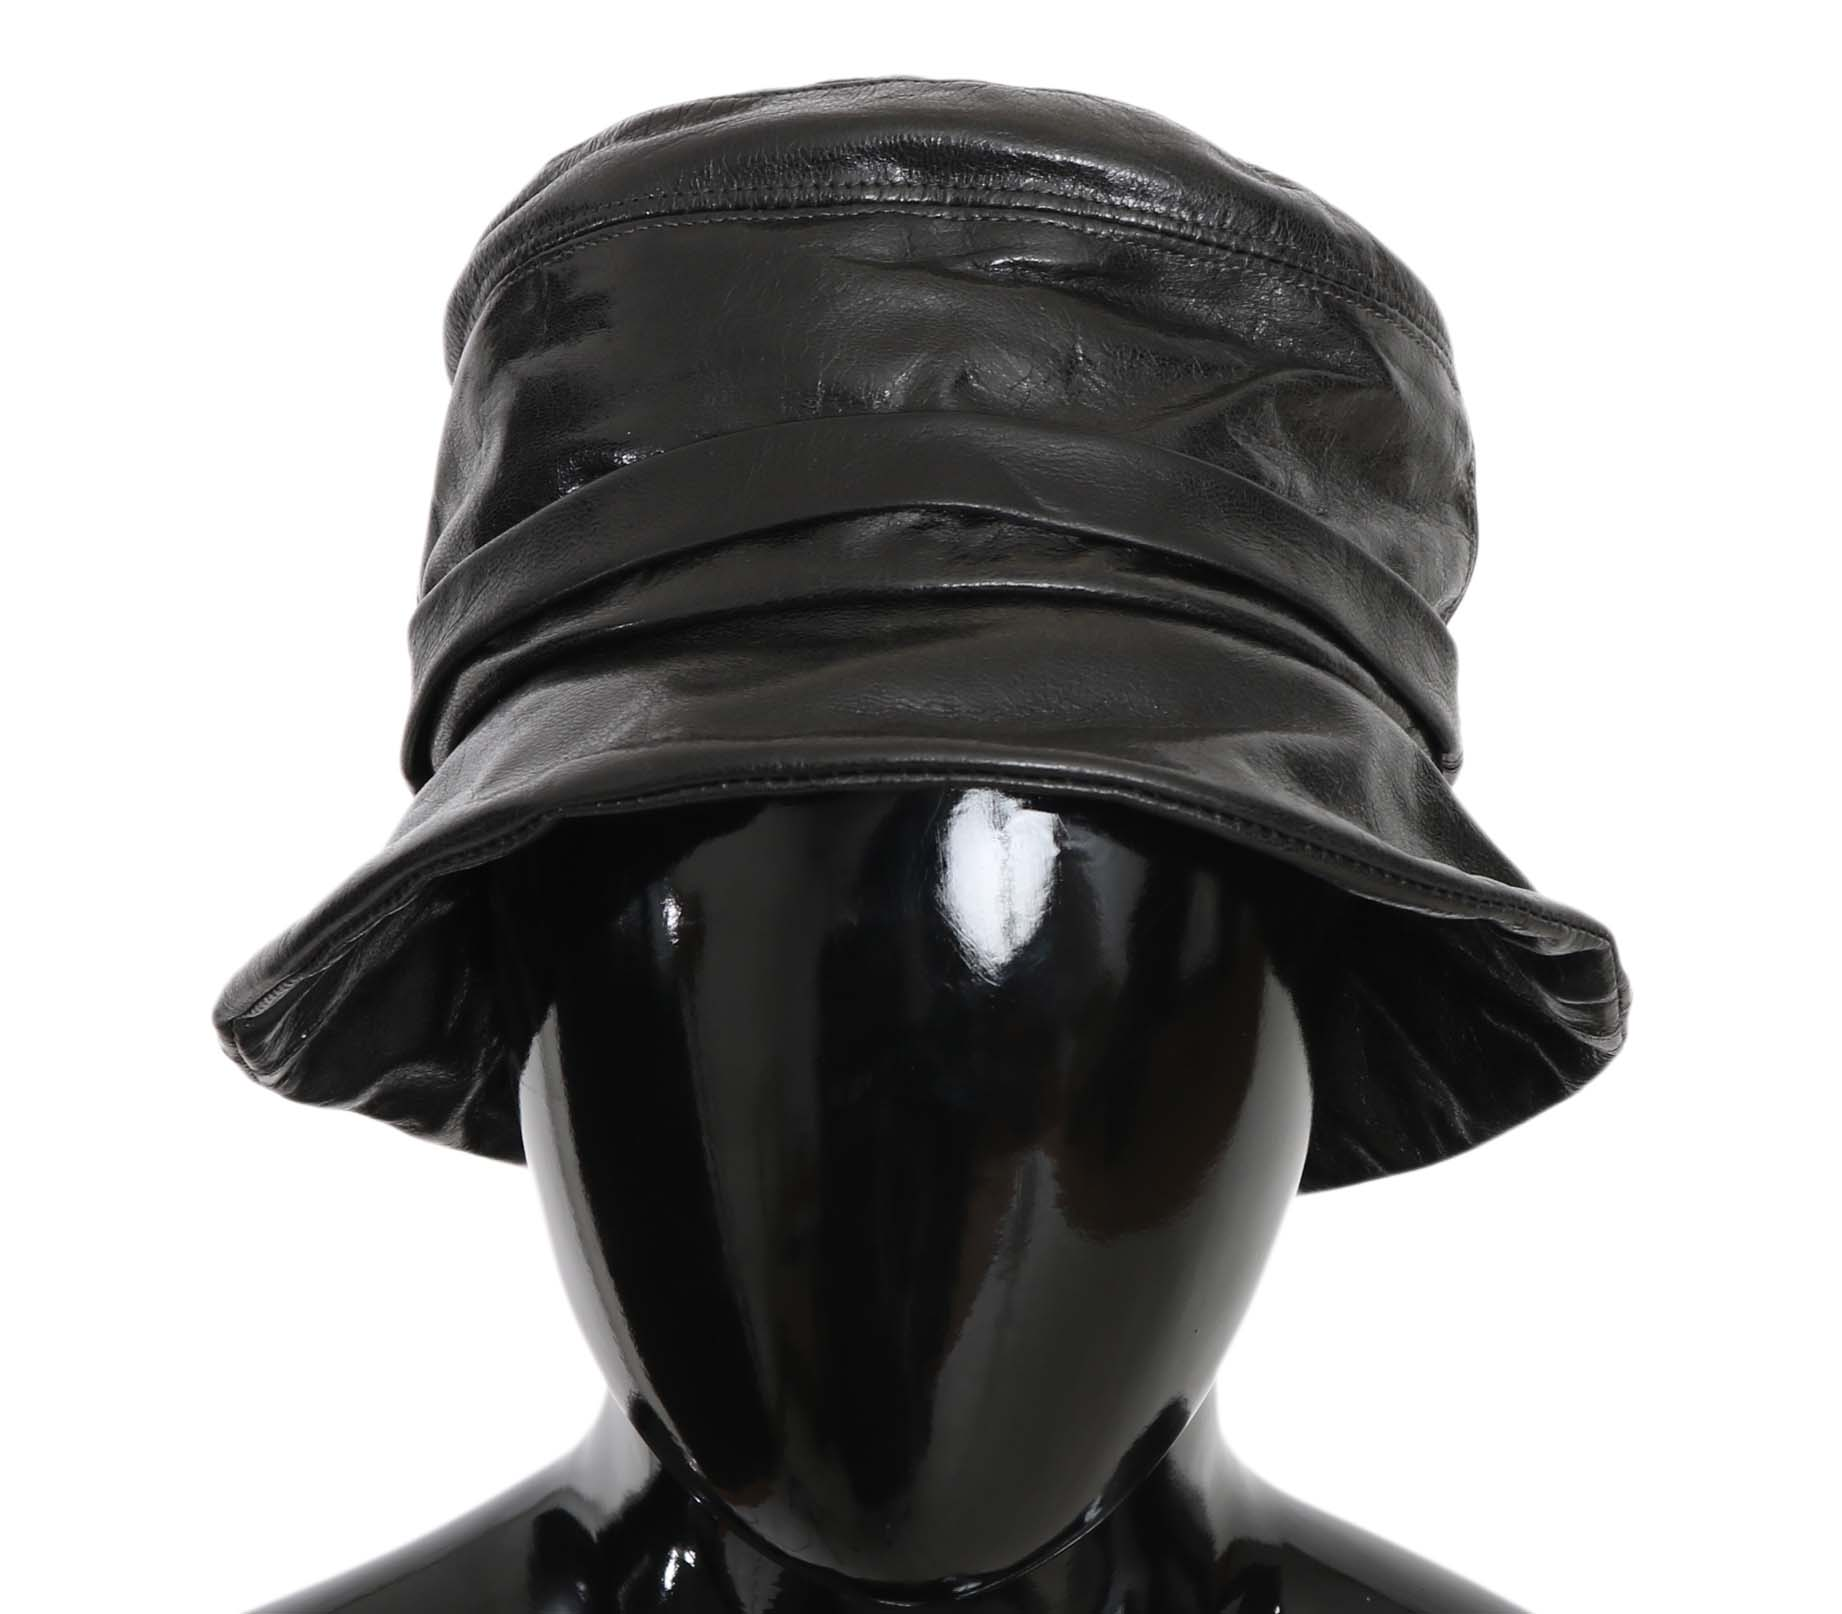 Dolce & Gabbana Women's Hat Black HAT70220 - 56 cm|XS